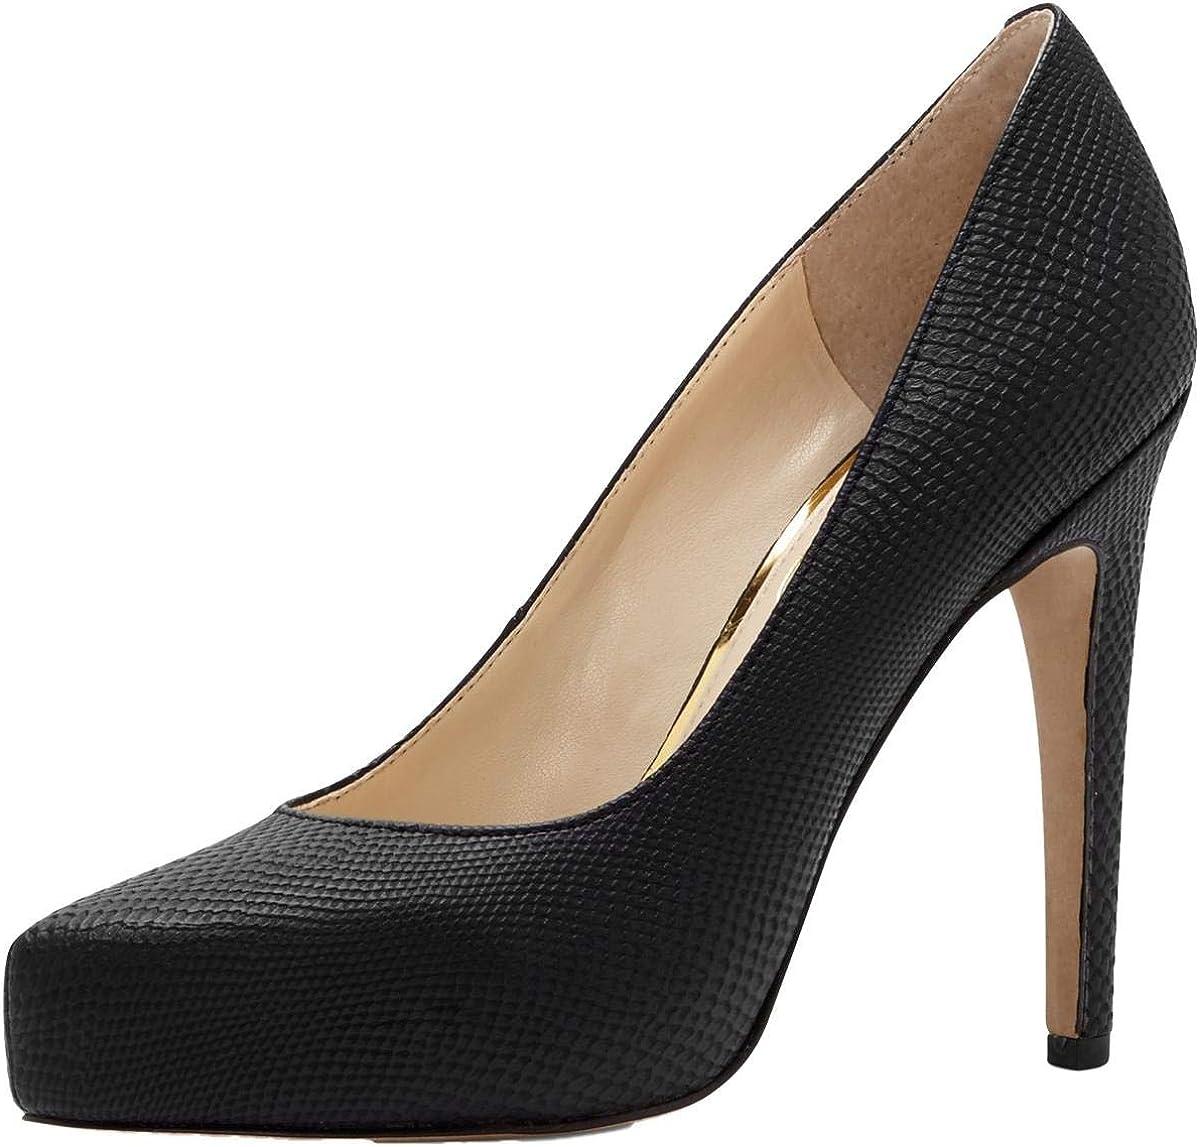 Jessica Simpson Women's Parisah Platform Stiletto Heel Pumps